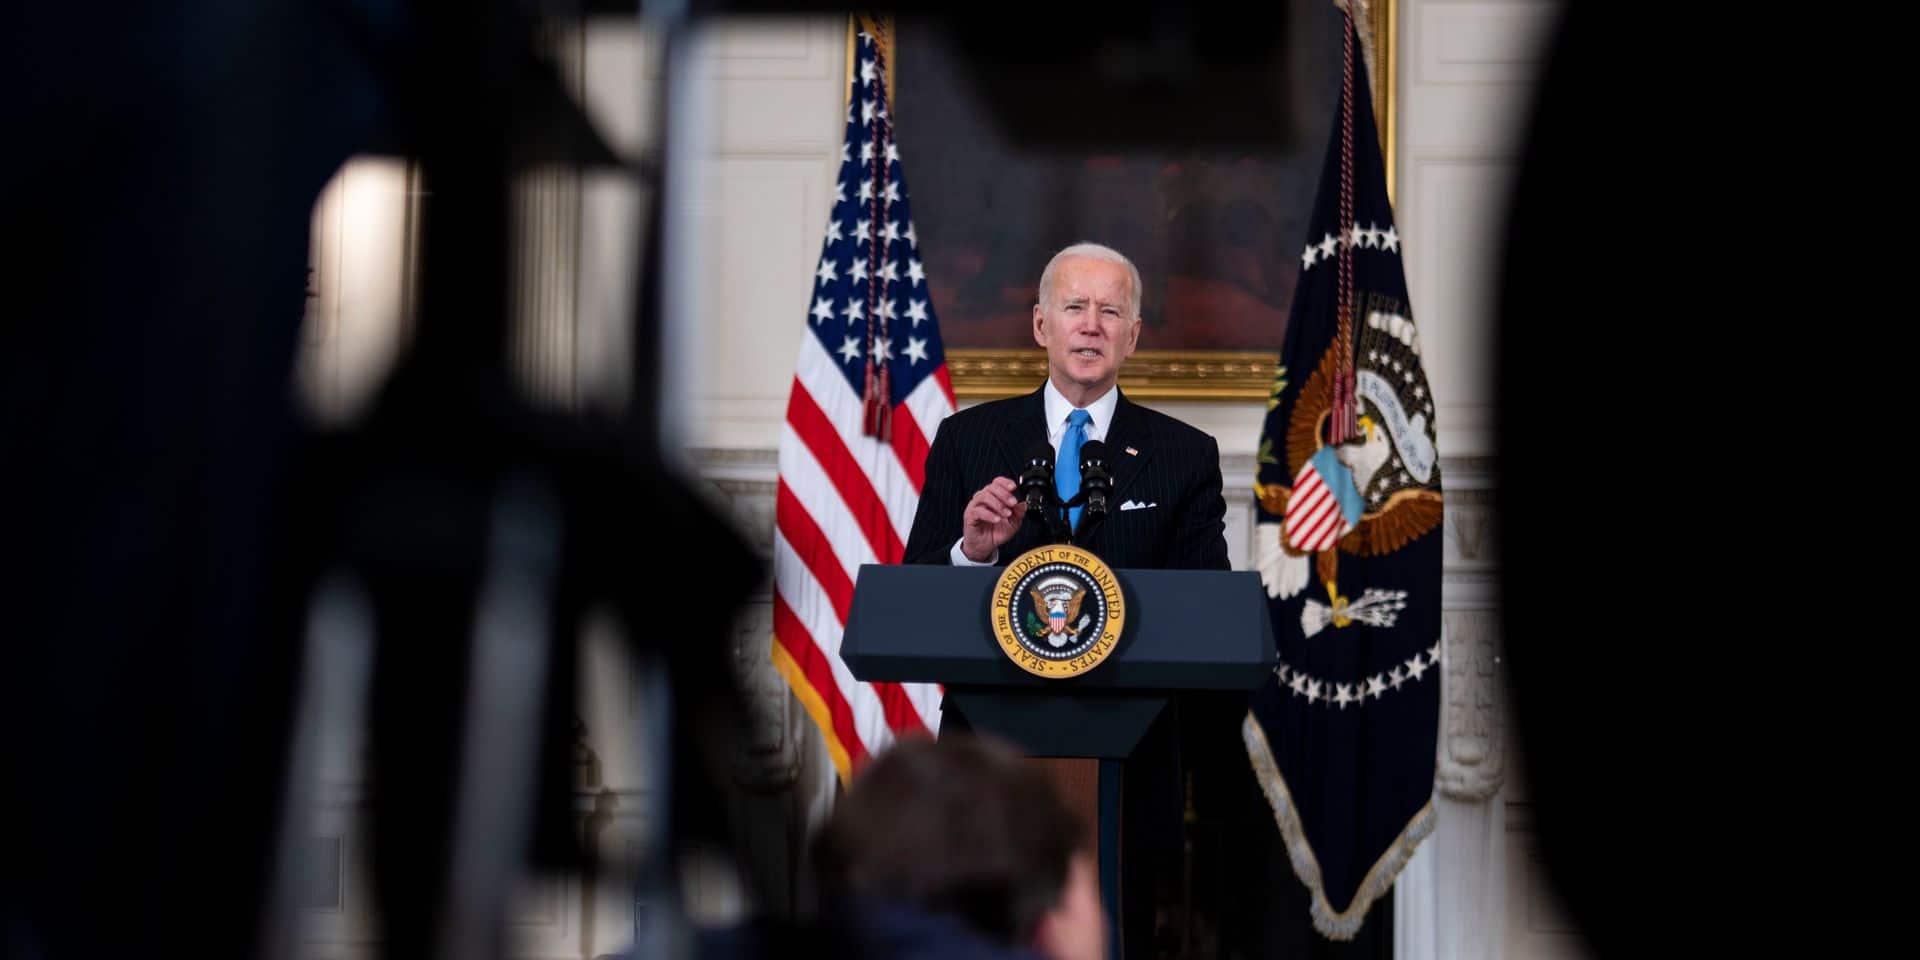 Biden Announces Partnership between Johnson and Johnson and Merck to Produce Covid Vaccine